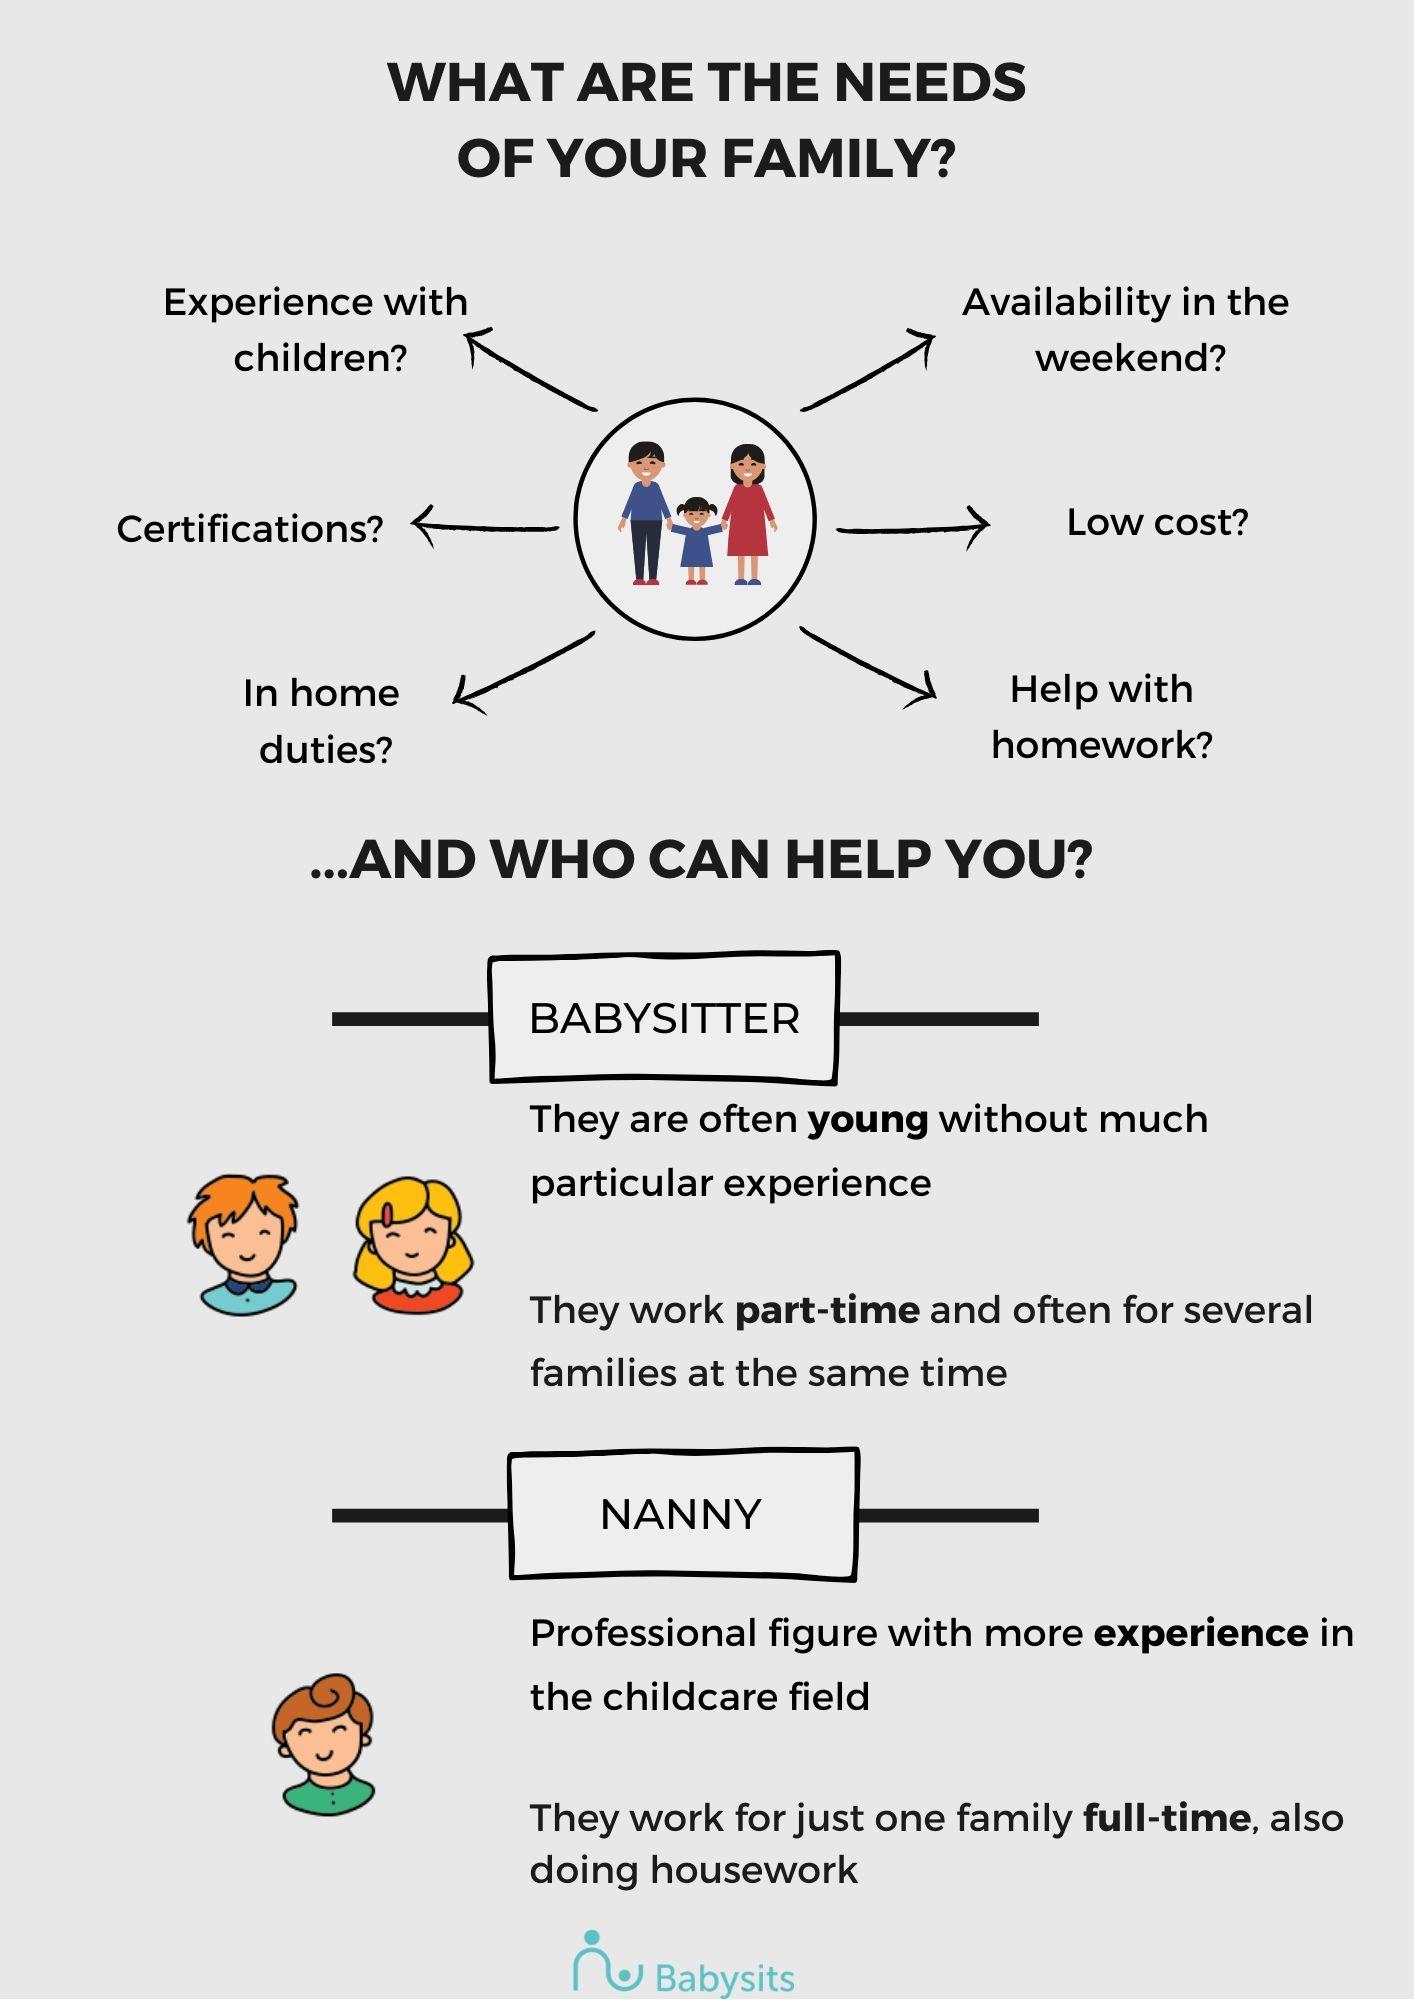 Babysitter or Nanny